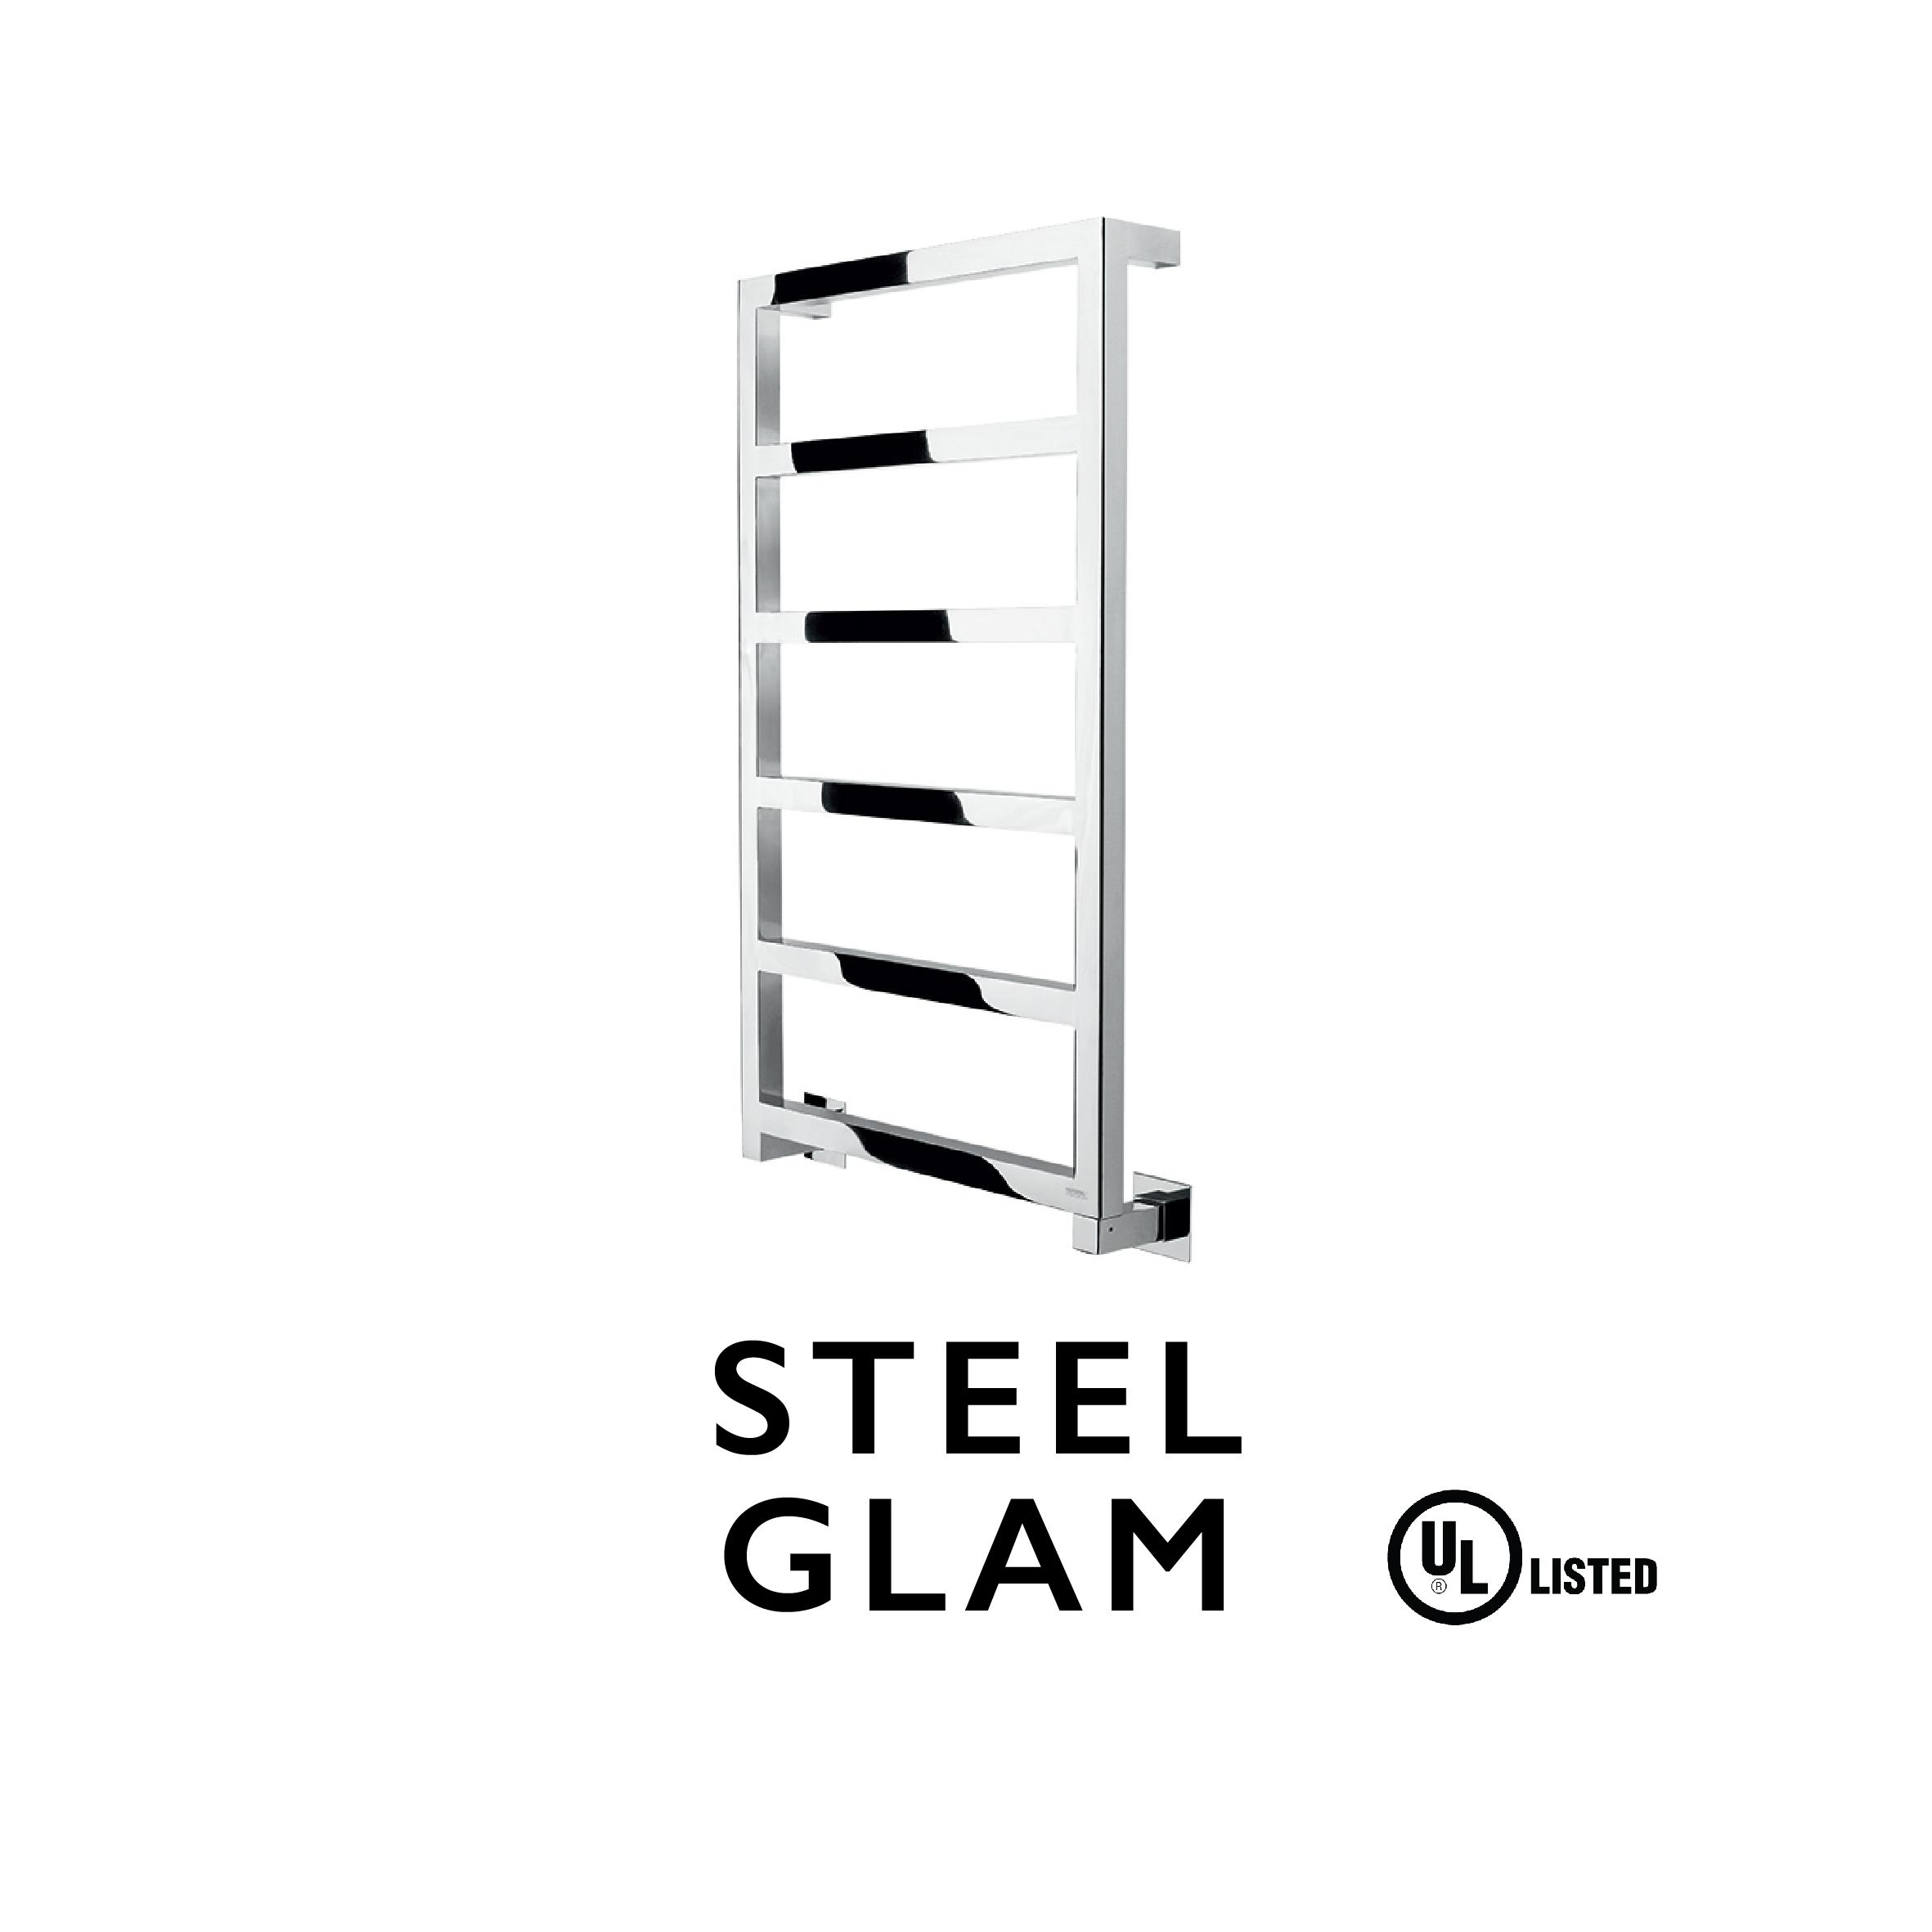 STEEL GLAM – MANUAL DE INSTRUÇÕES